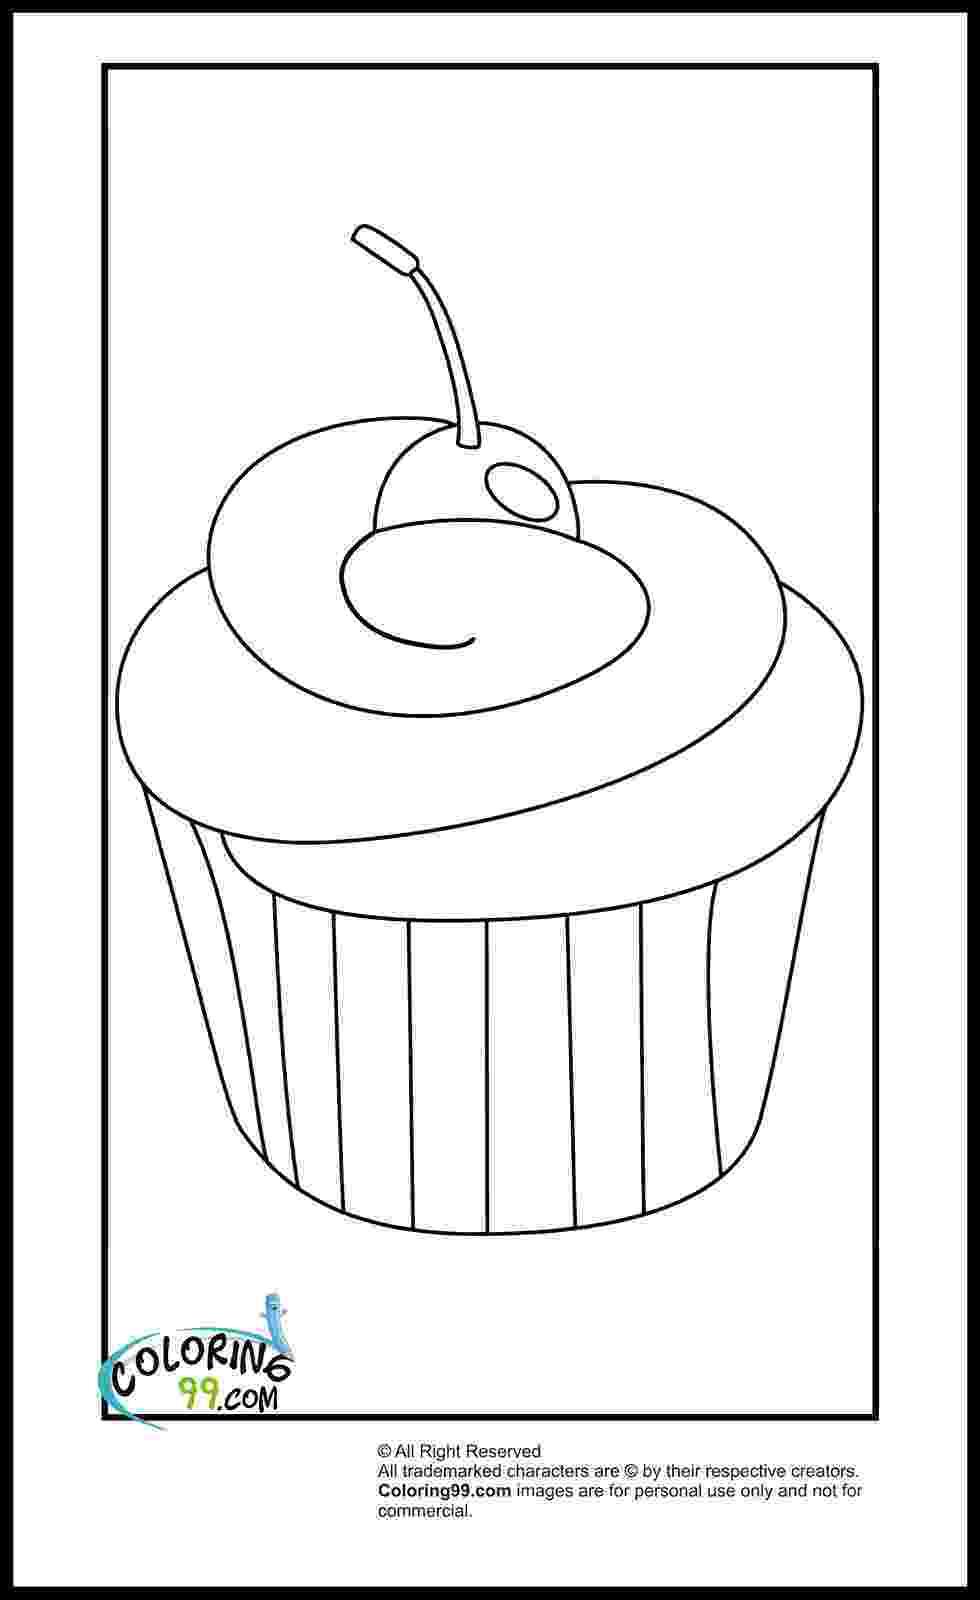 coloring pages cupcakes cupcake coloring pages team colors cupcakes pages coloring